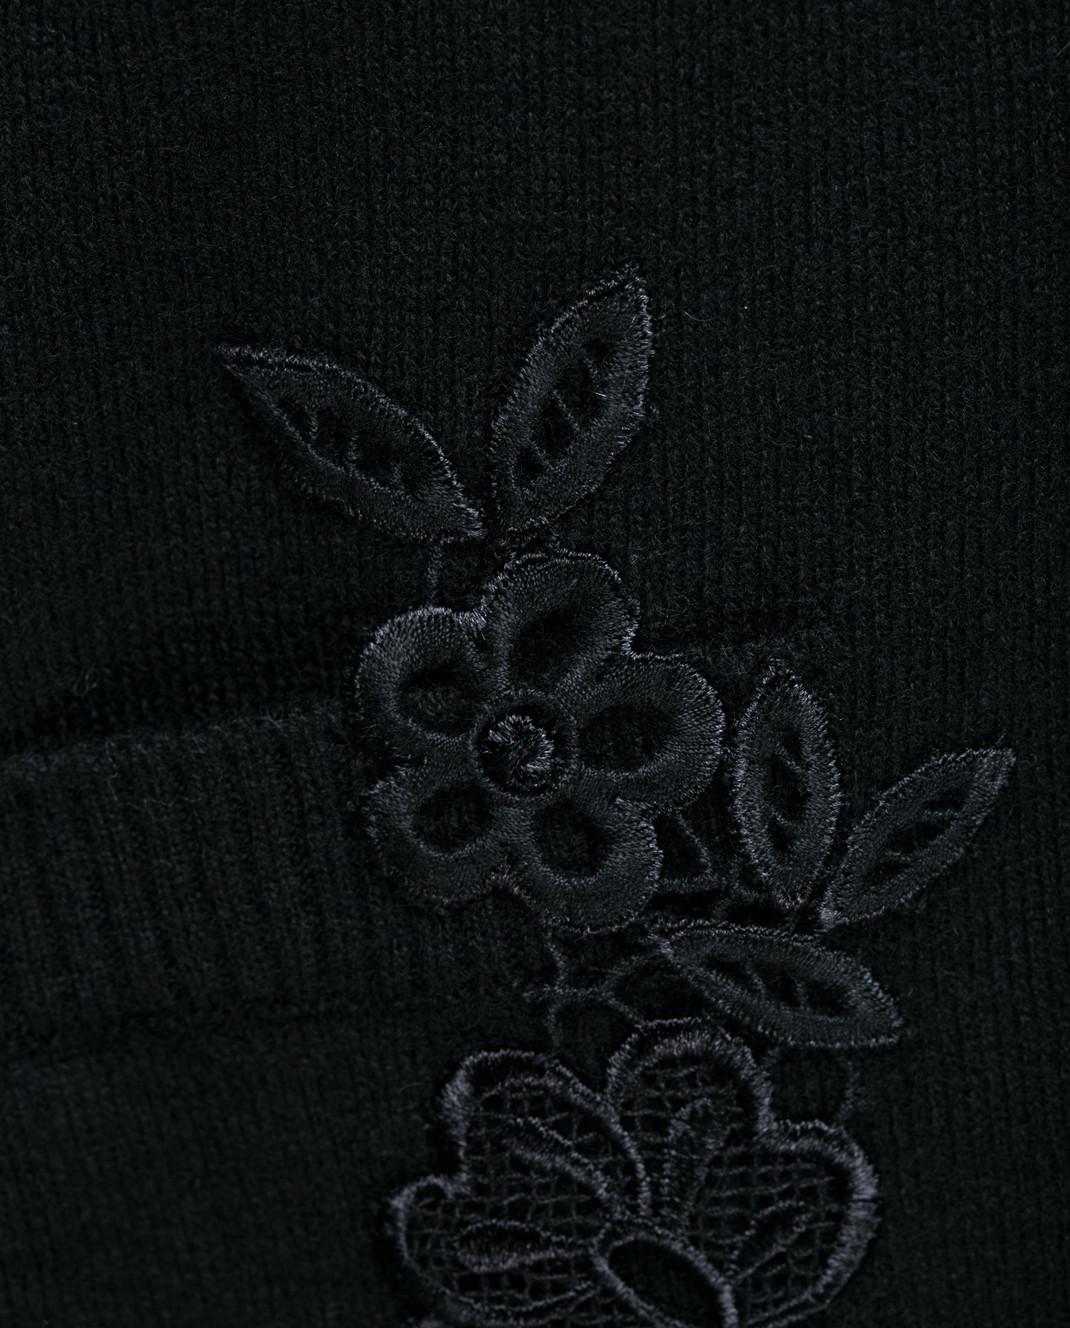 Ermanno Черный кардиган  MG61 изображение 5